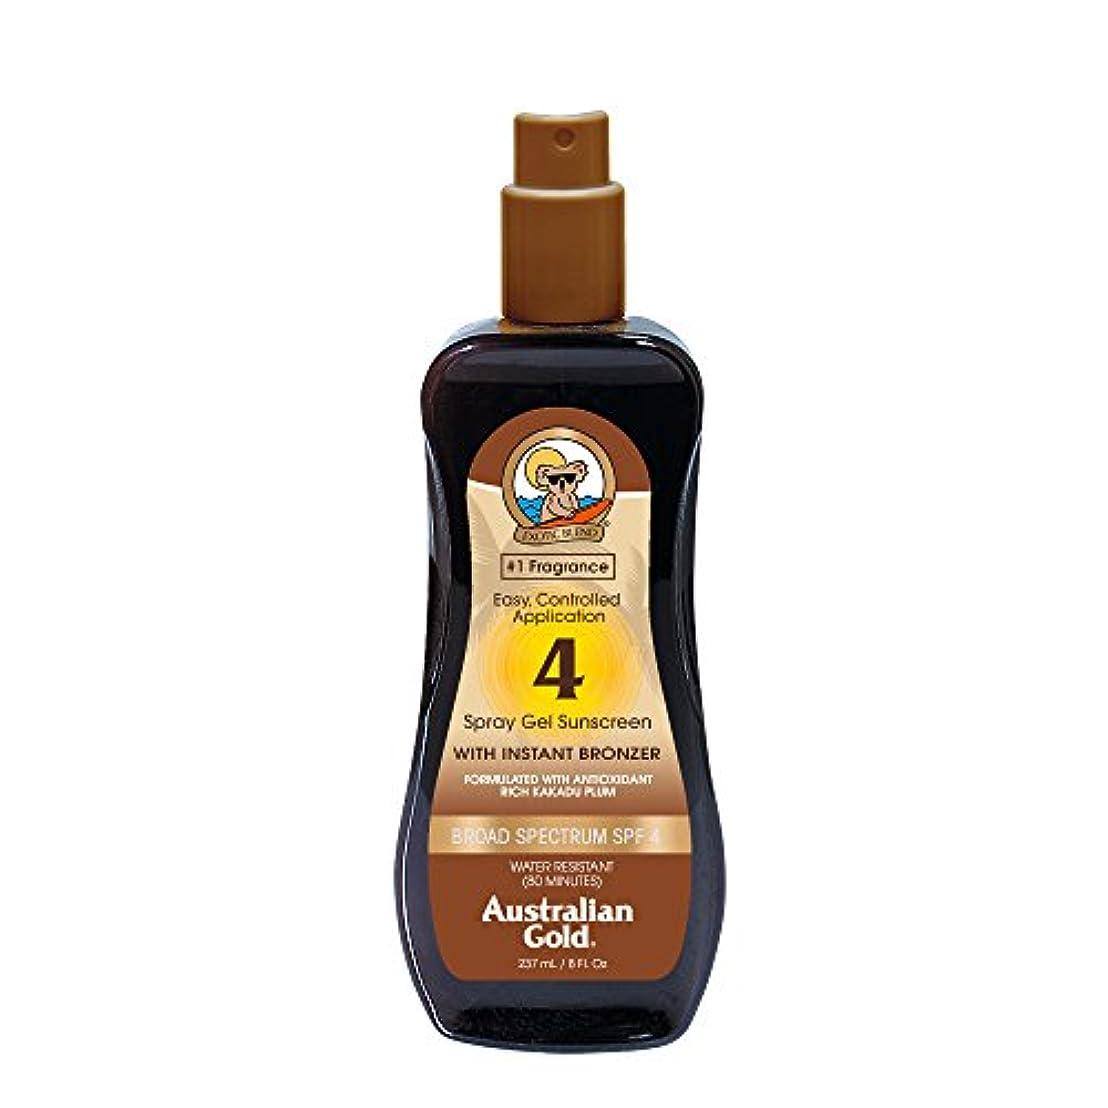 海外障害者謝罪Australian Gold Spray Gel Sunscreen Broad Spectrum SPF 4 with Instant Bronzer 237ml/8oz並行輸入品